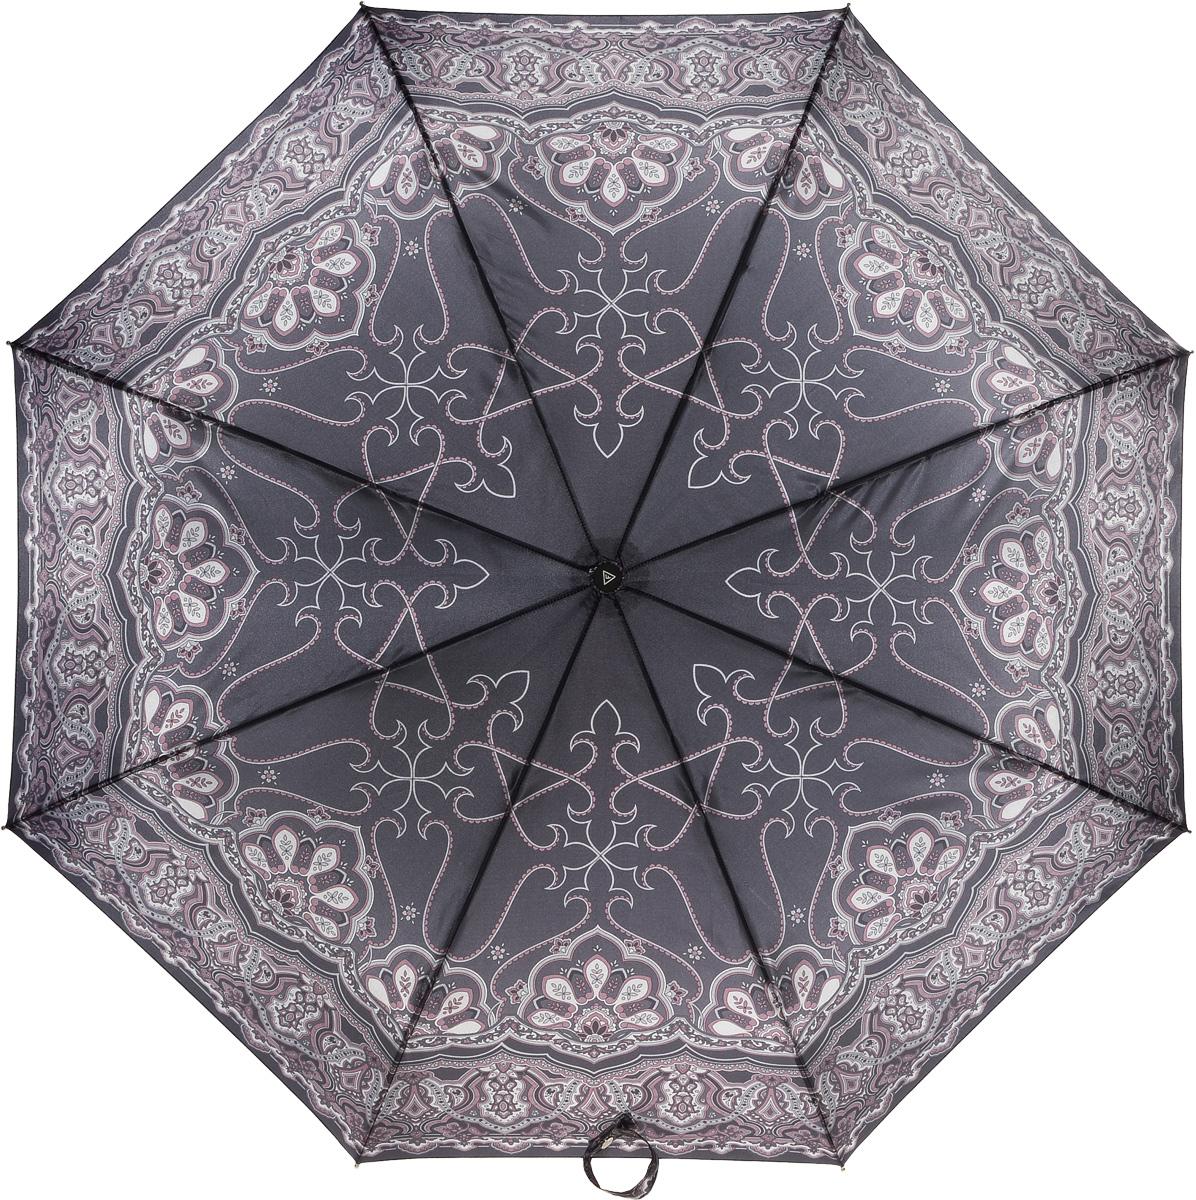 Зонт женский Fabretti, автомат, 3 сложения. L-16104-6L-16104-6Зонт женский Fabretti, облегченный суперавтомат, 3 сложения